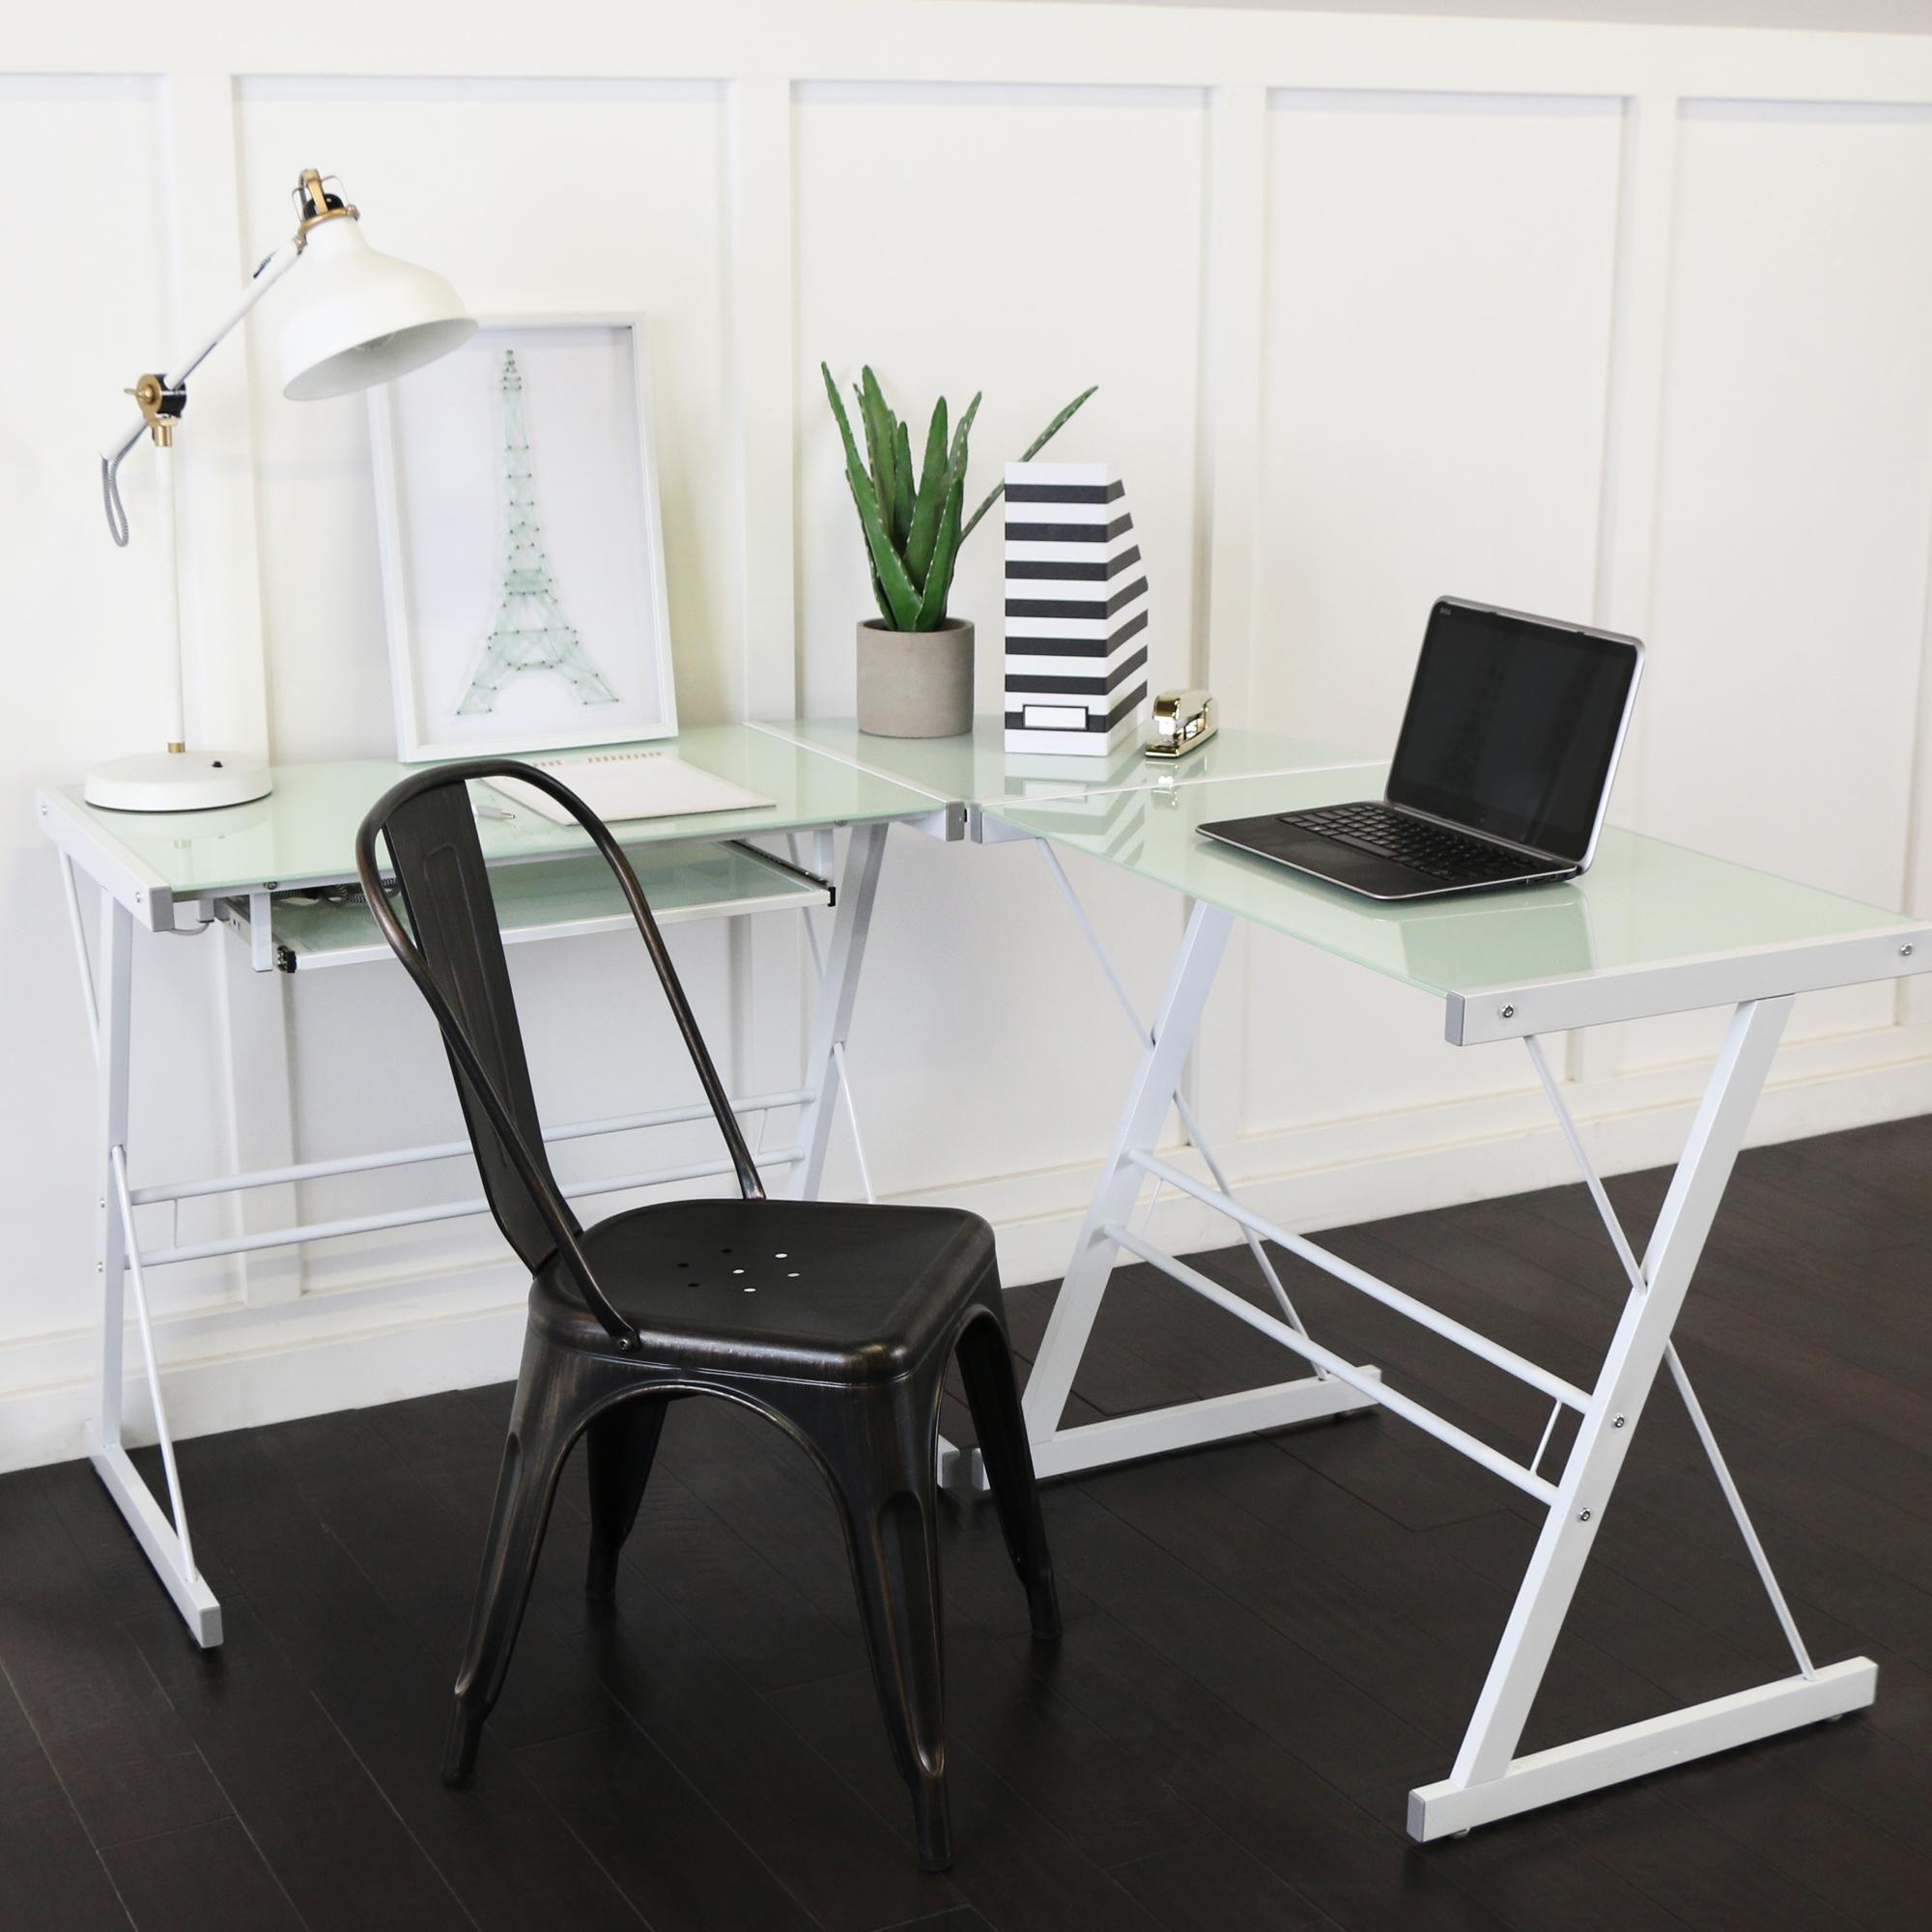 Incroyable Amazon.com: Walker Edison 3 Piece Contemporary Desk, Multi: Kitchen U0026